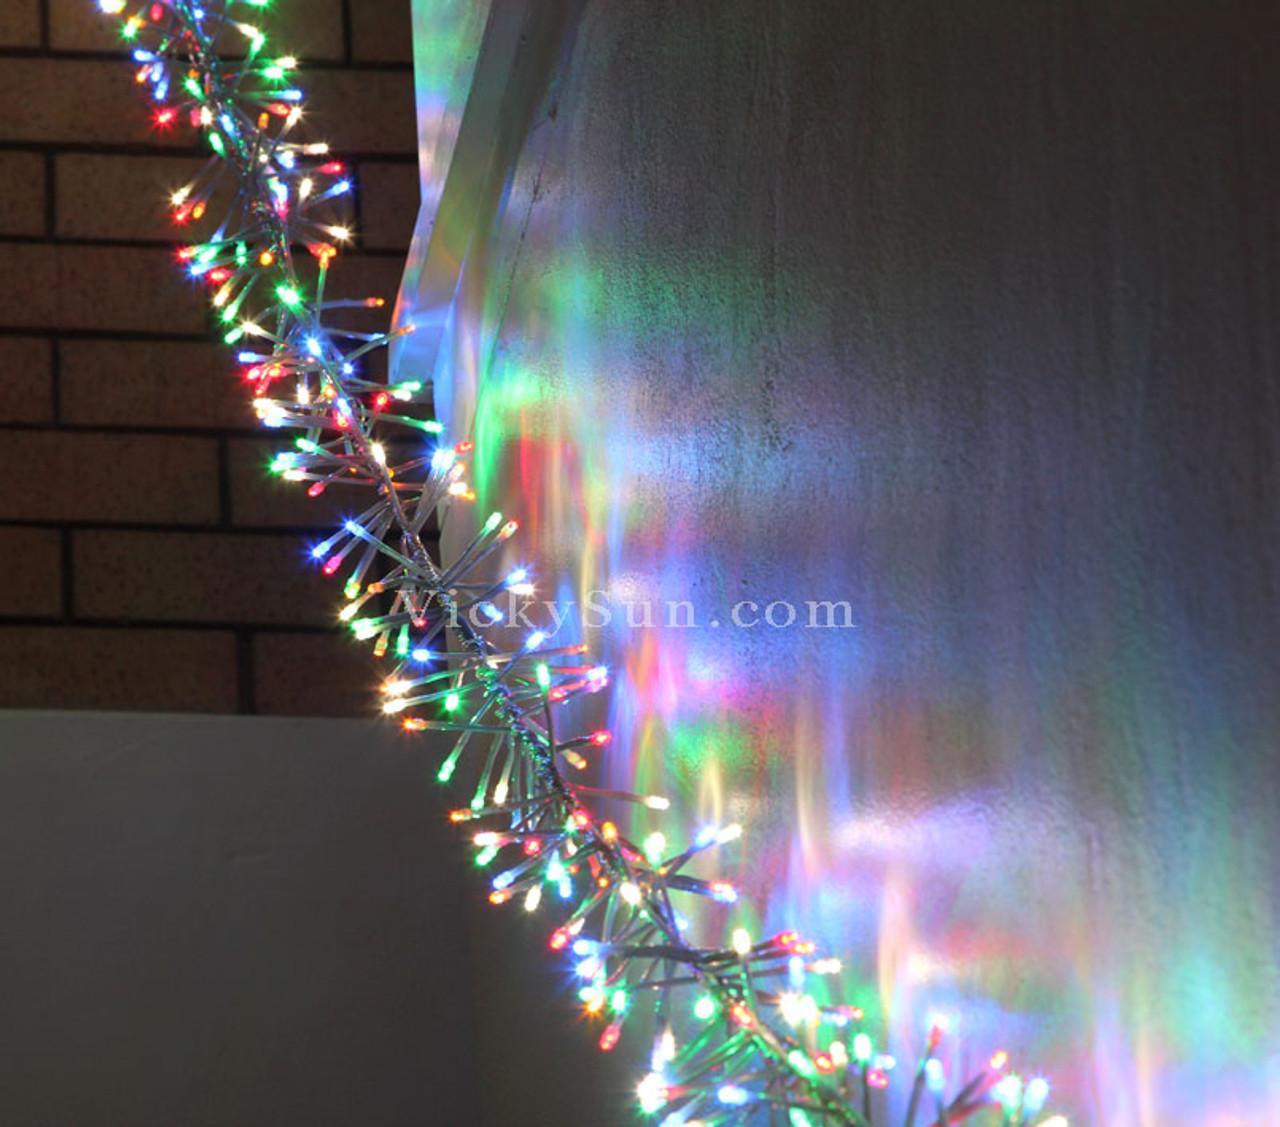 Chaser Christmas Lights.5m 520 Led Multi Colours Firecracker Chaser String Christmas Lights Clear Wire